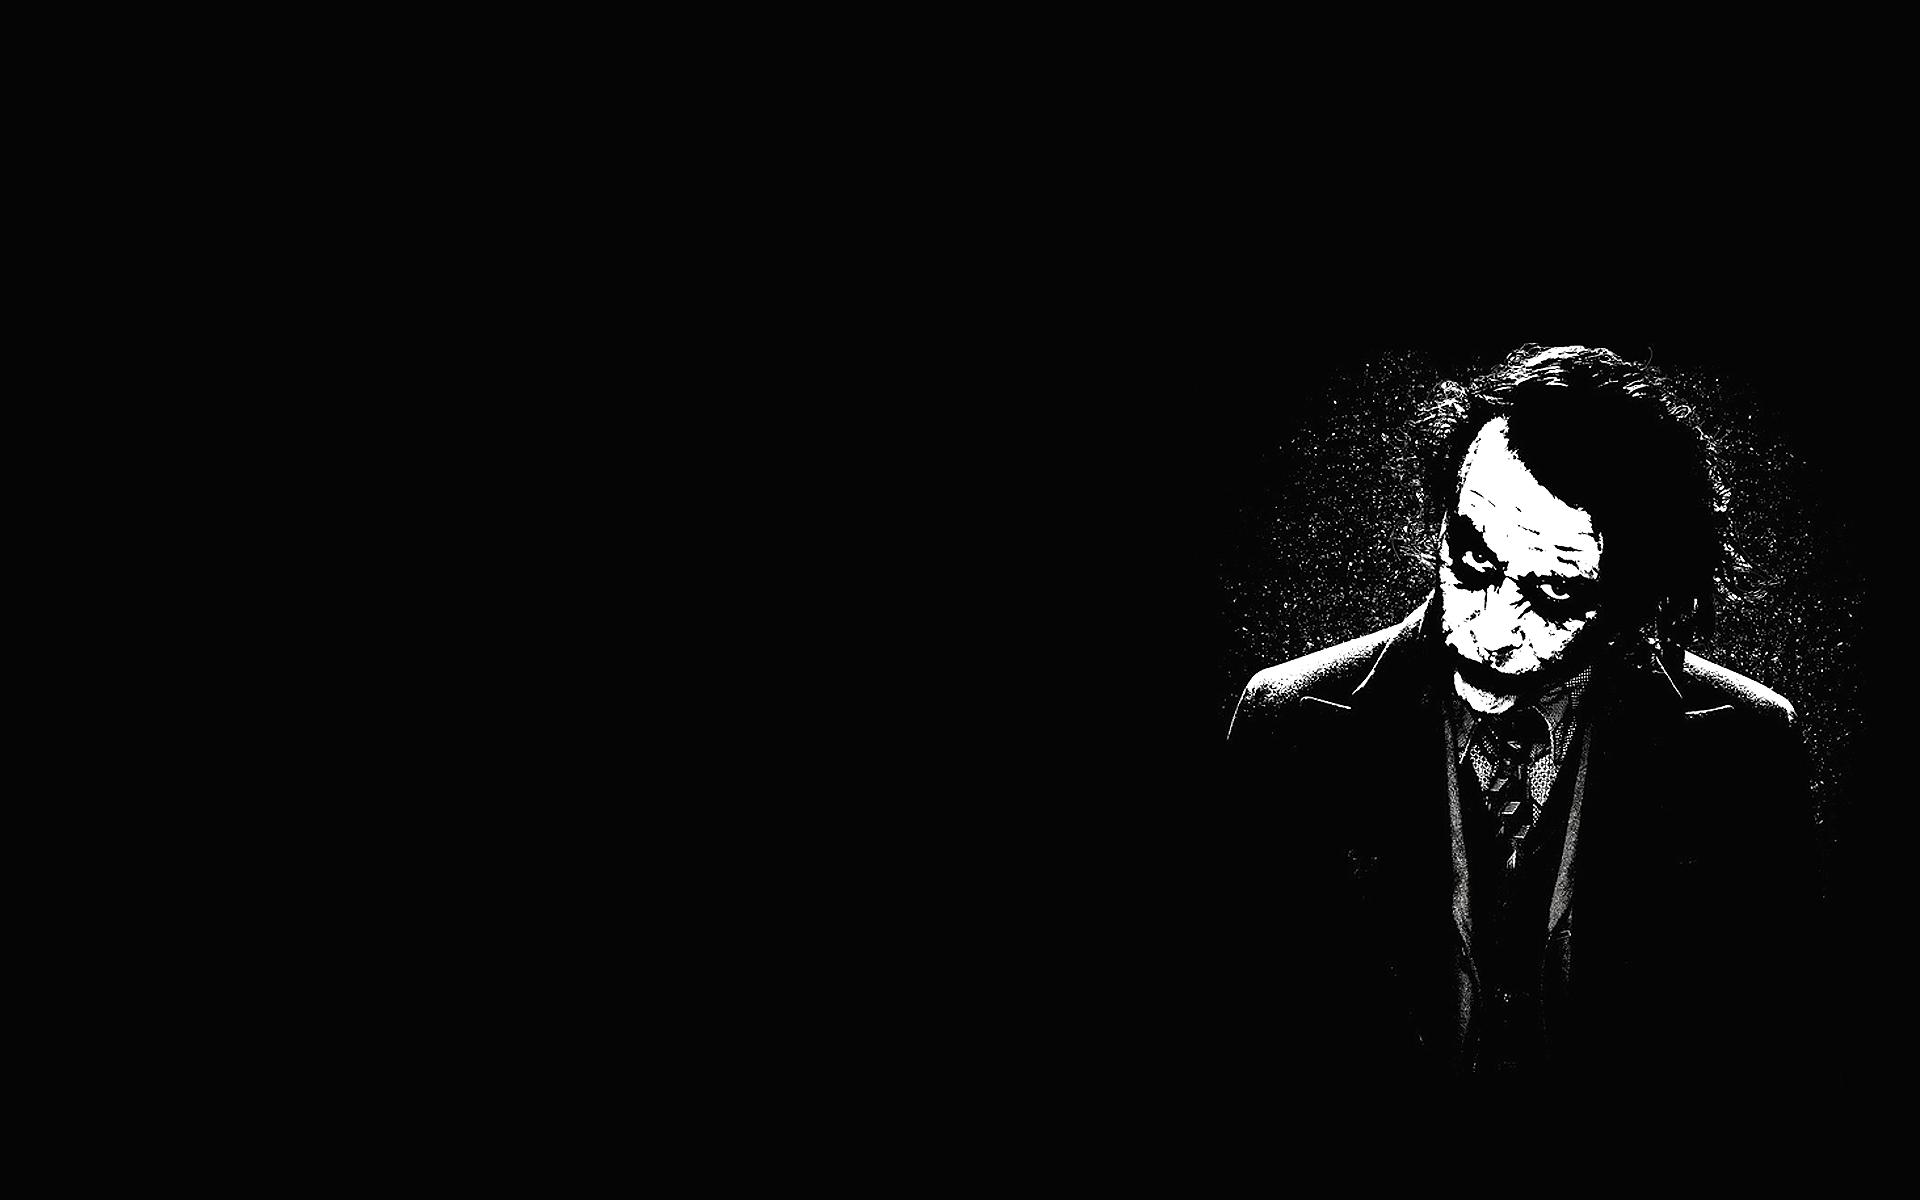 Batman And <b>Joker Wallpapers</b> - <b>Wallpaper</b> Cave